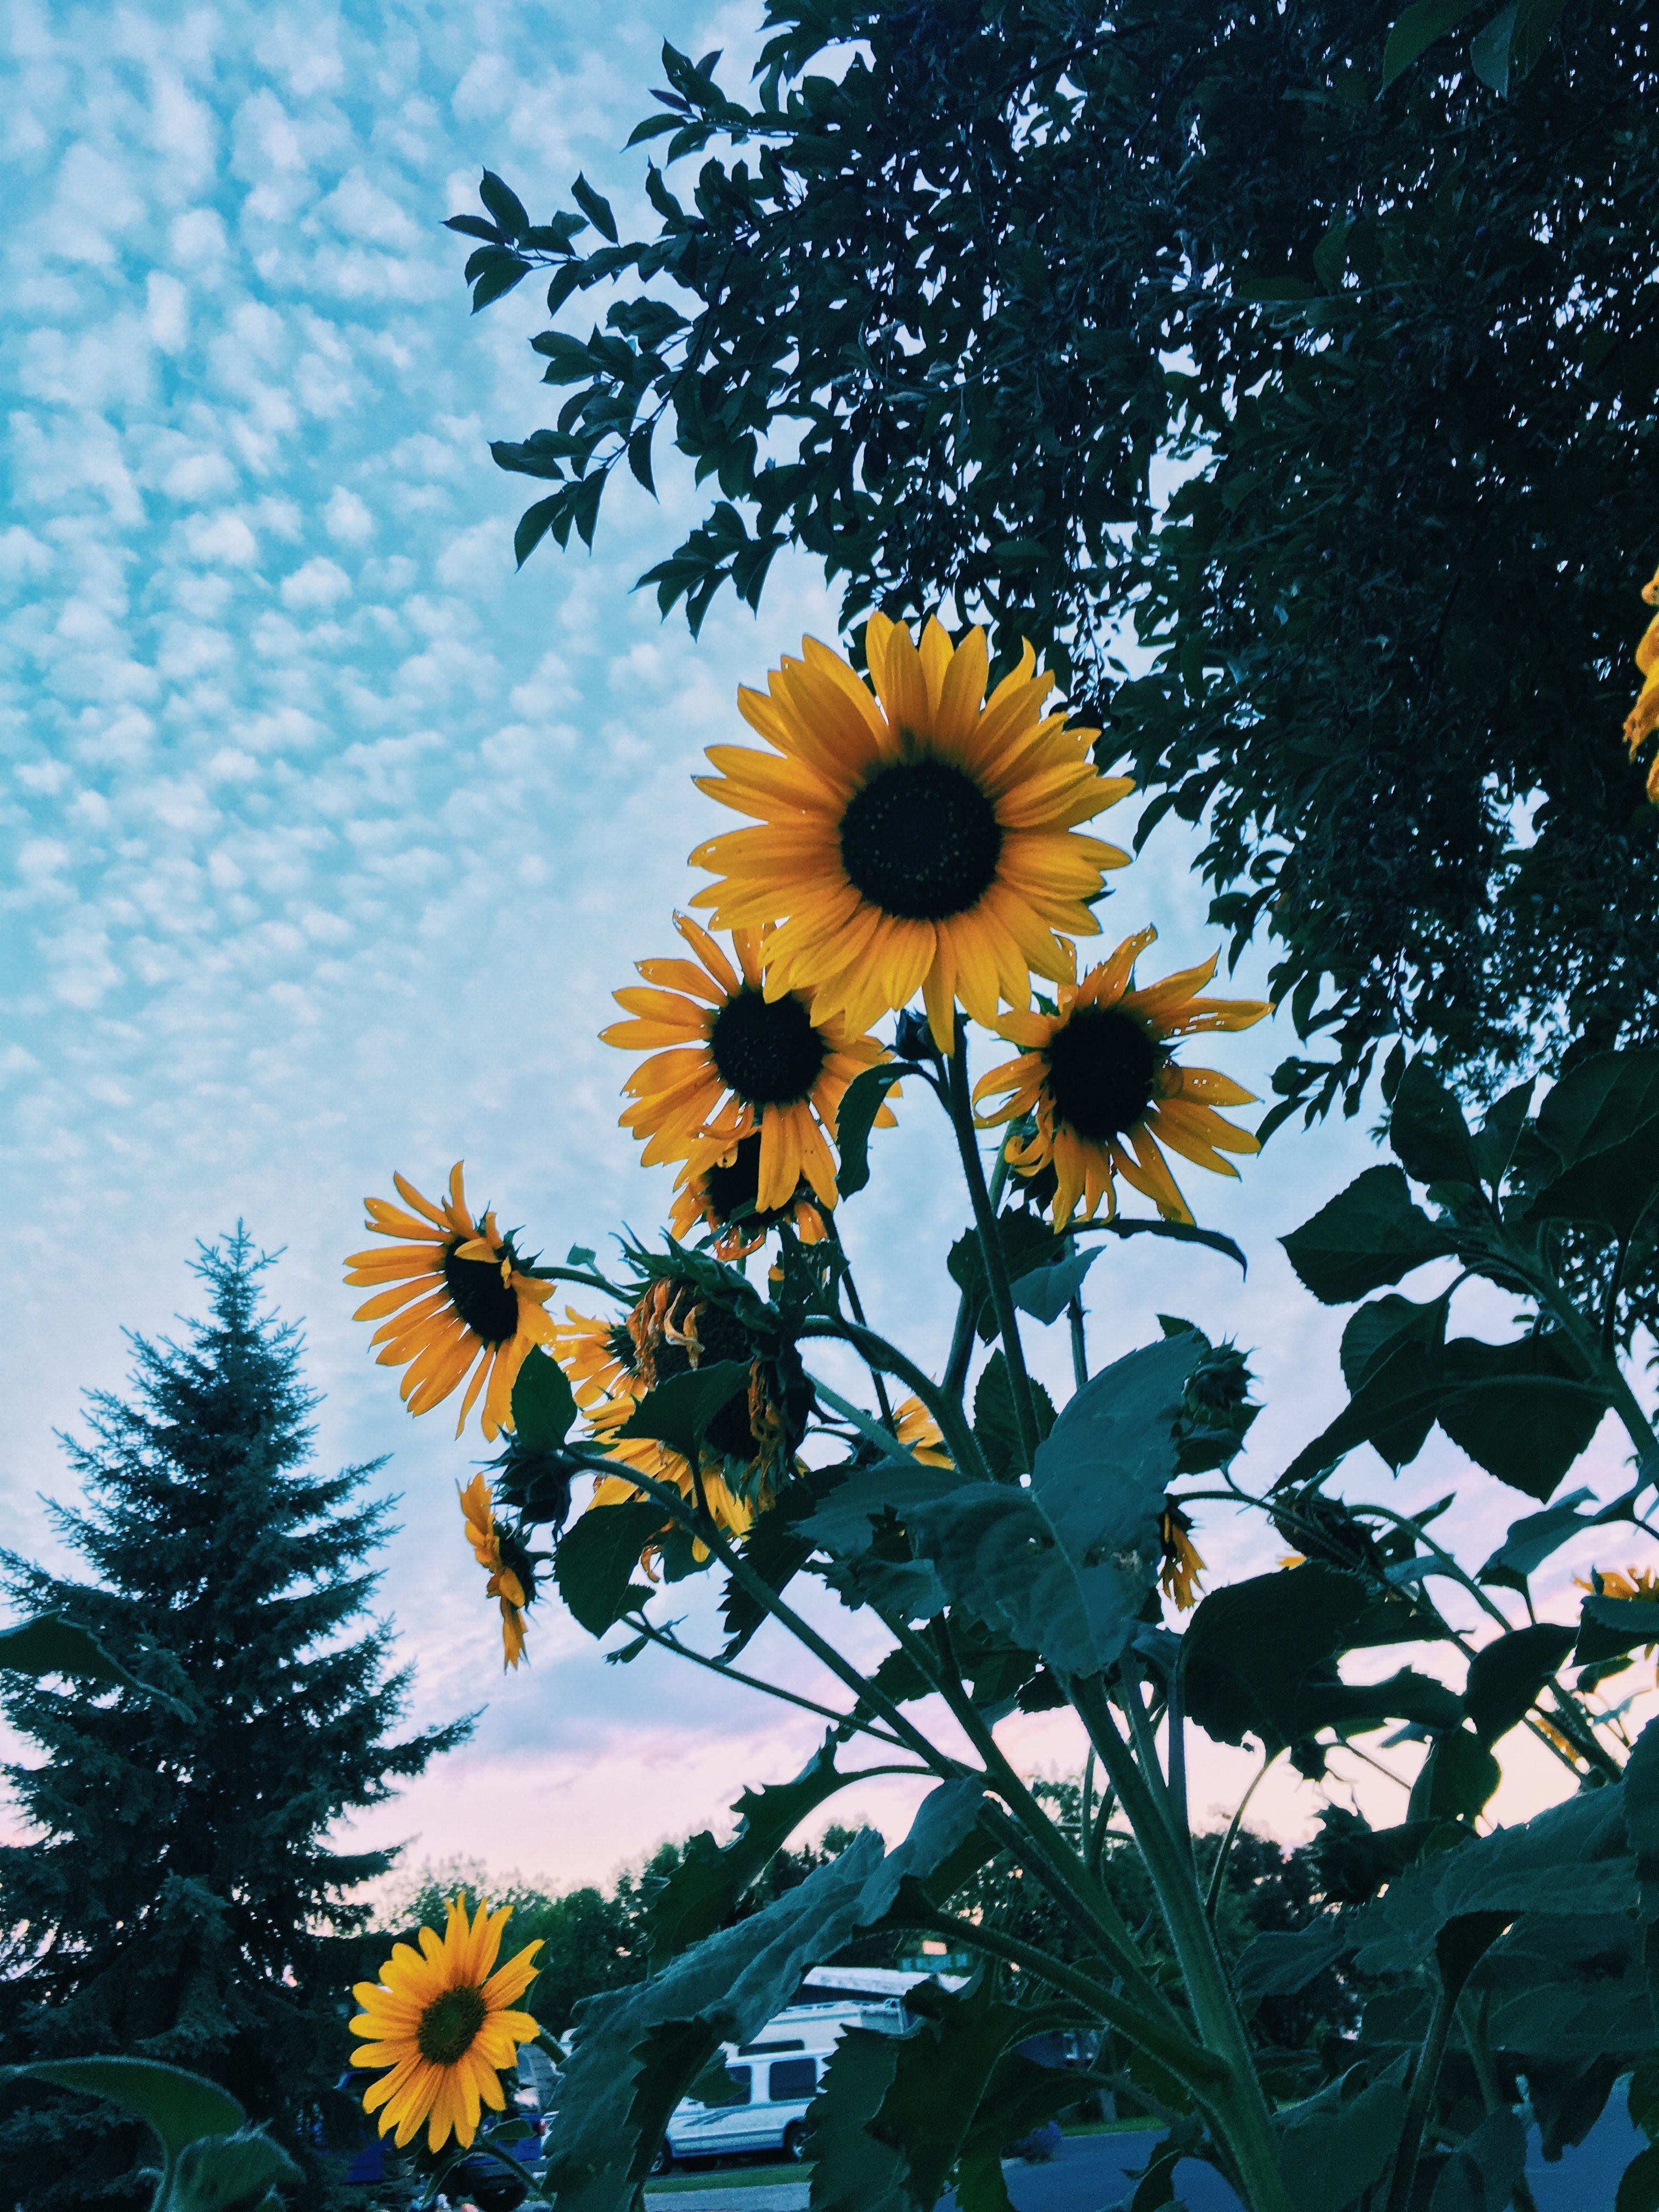 P I N T E R E S T Cora Rose 3 In 2020 Sunflower Wallpaper Sunflower Iphone Wallpaper Flower Phone Wallpaper